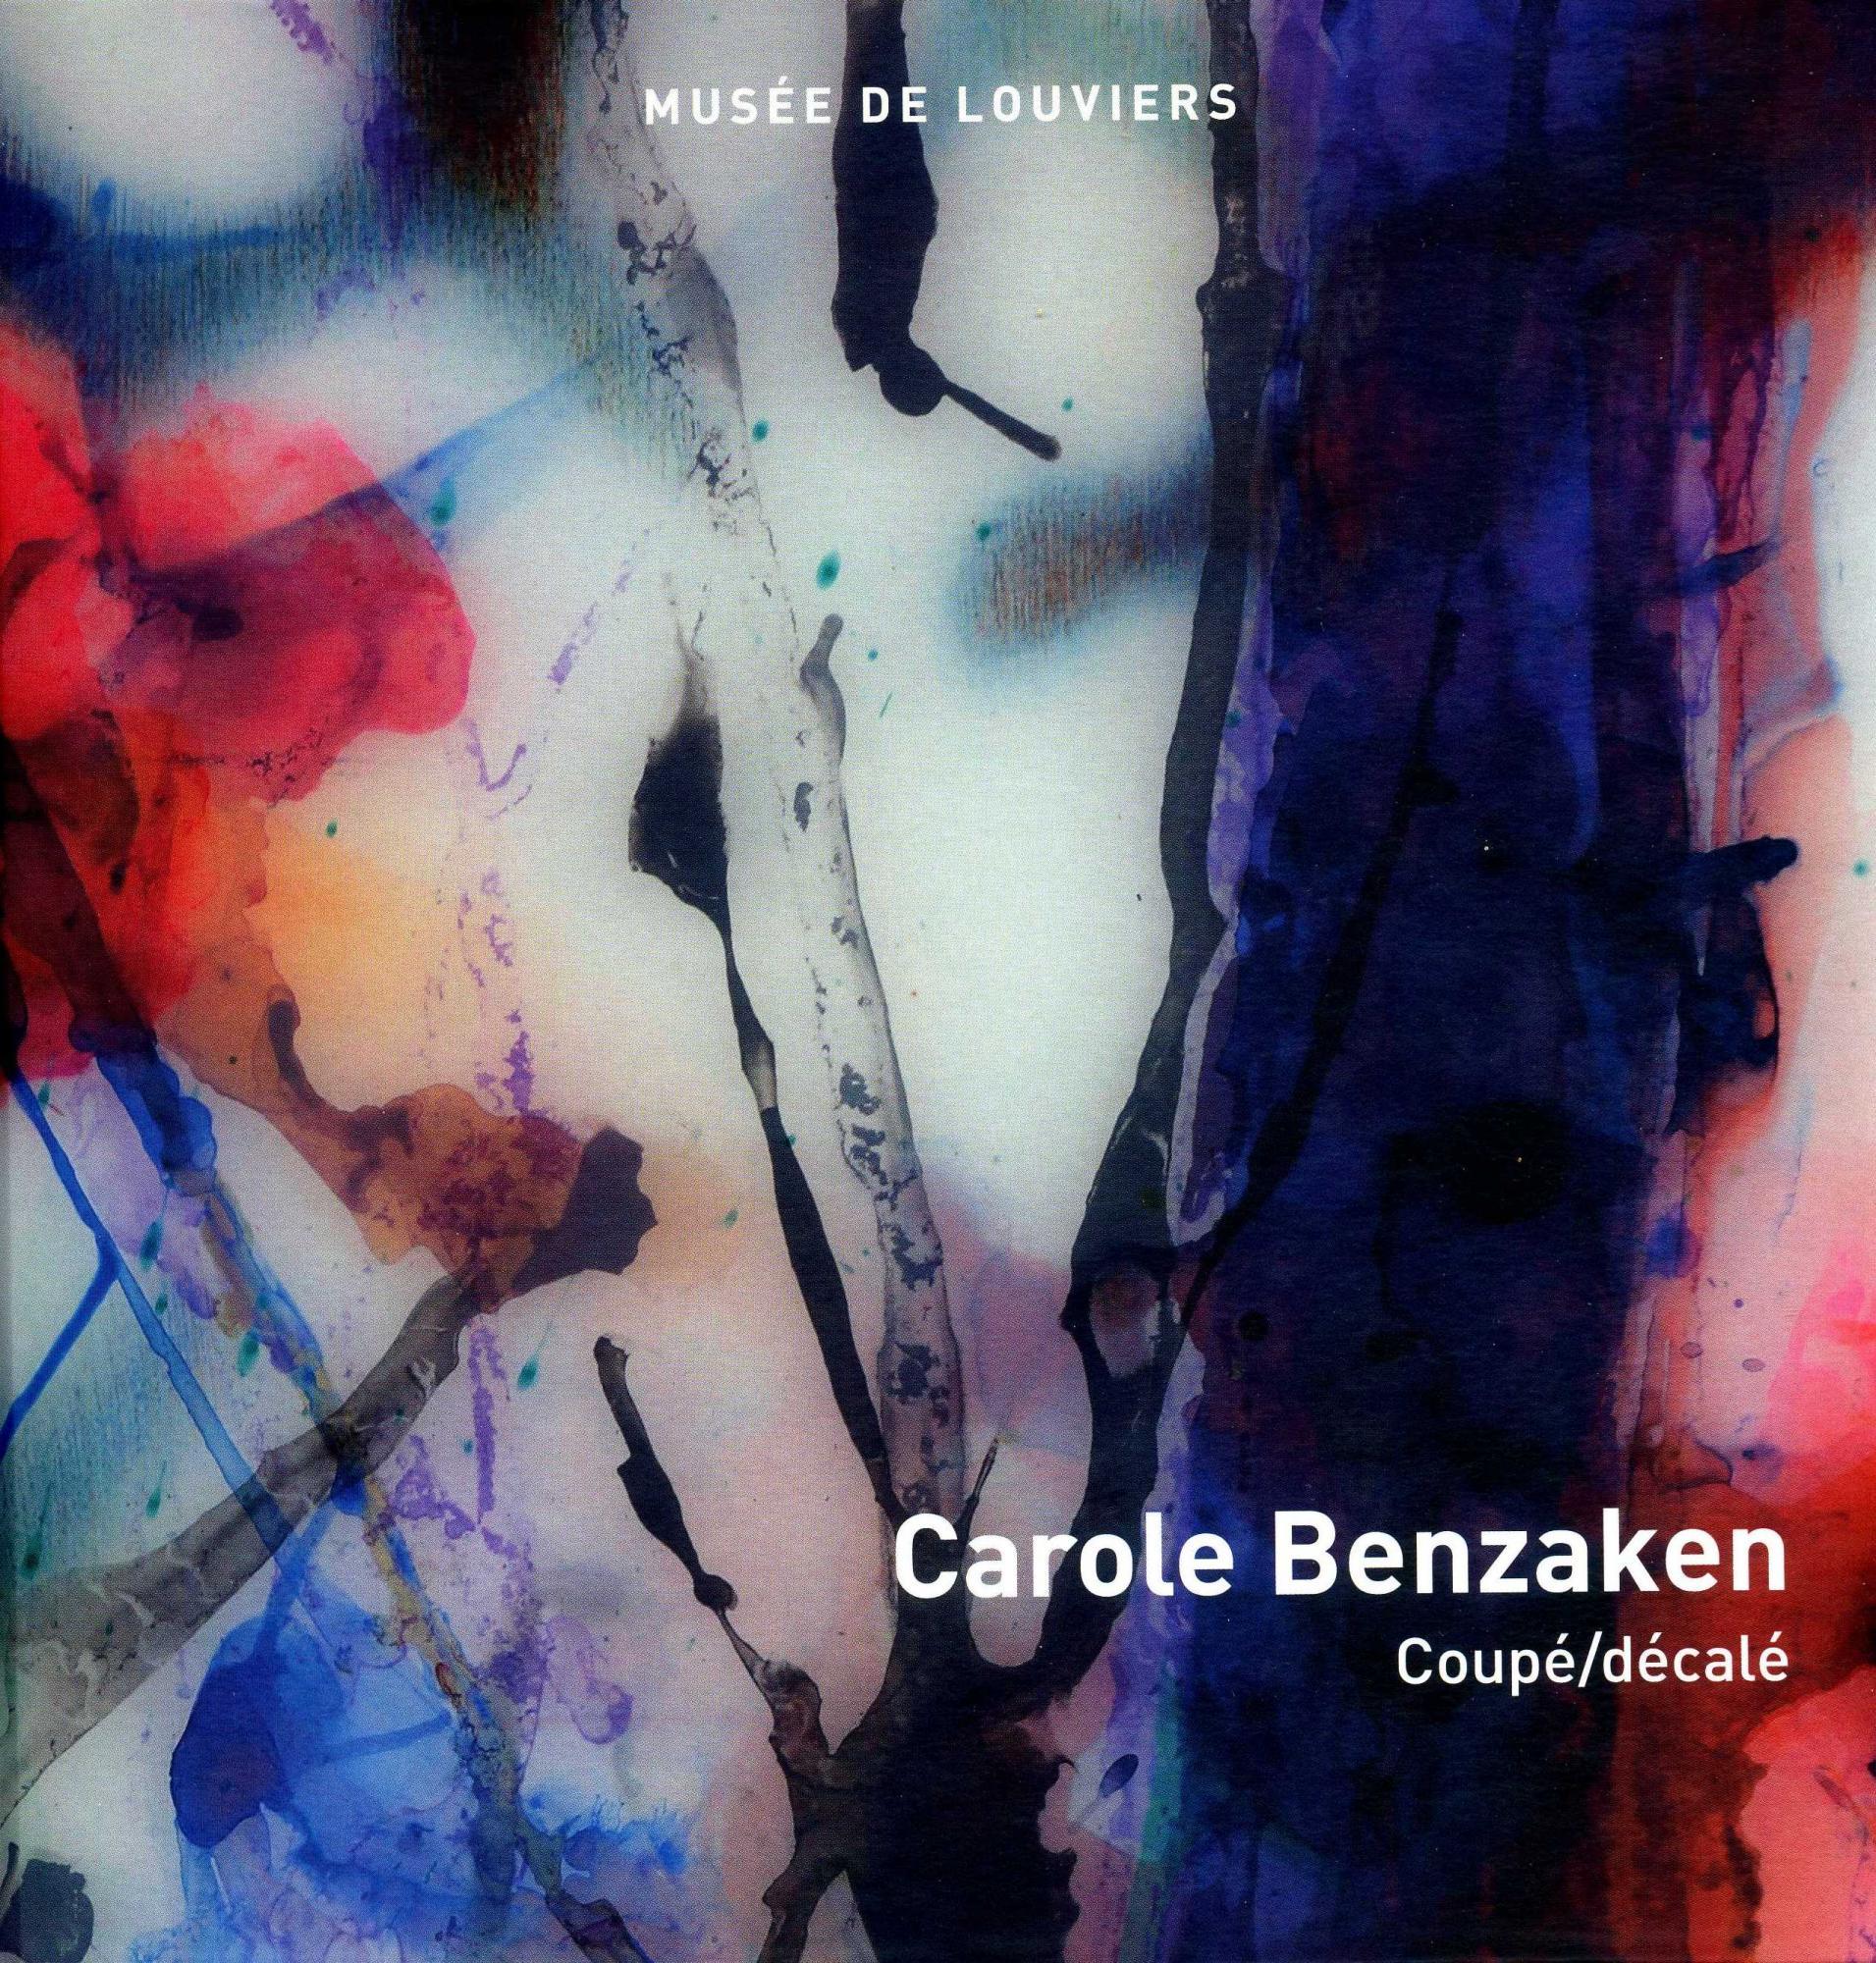 Carole Benzaken - Coupé / Décalé